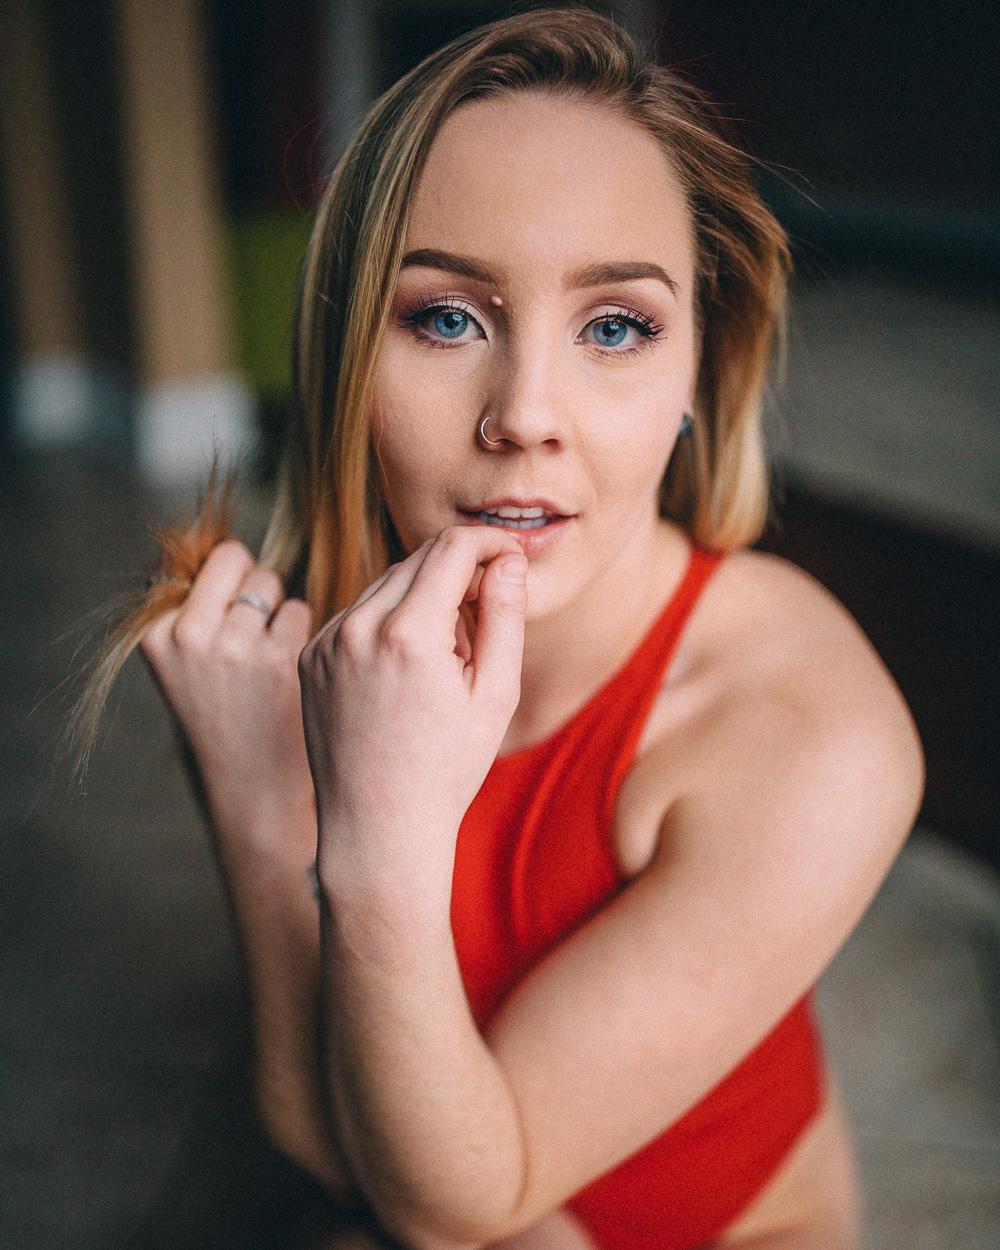 20180329_Alyssa_Maple-639.jpg